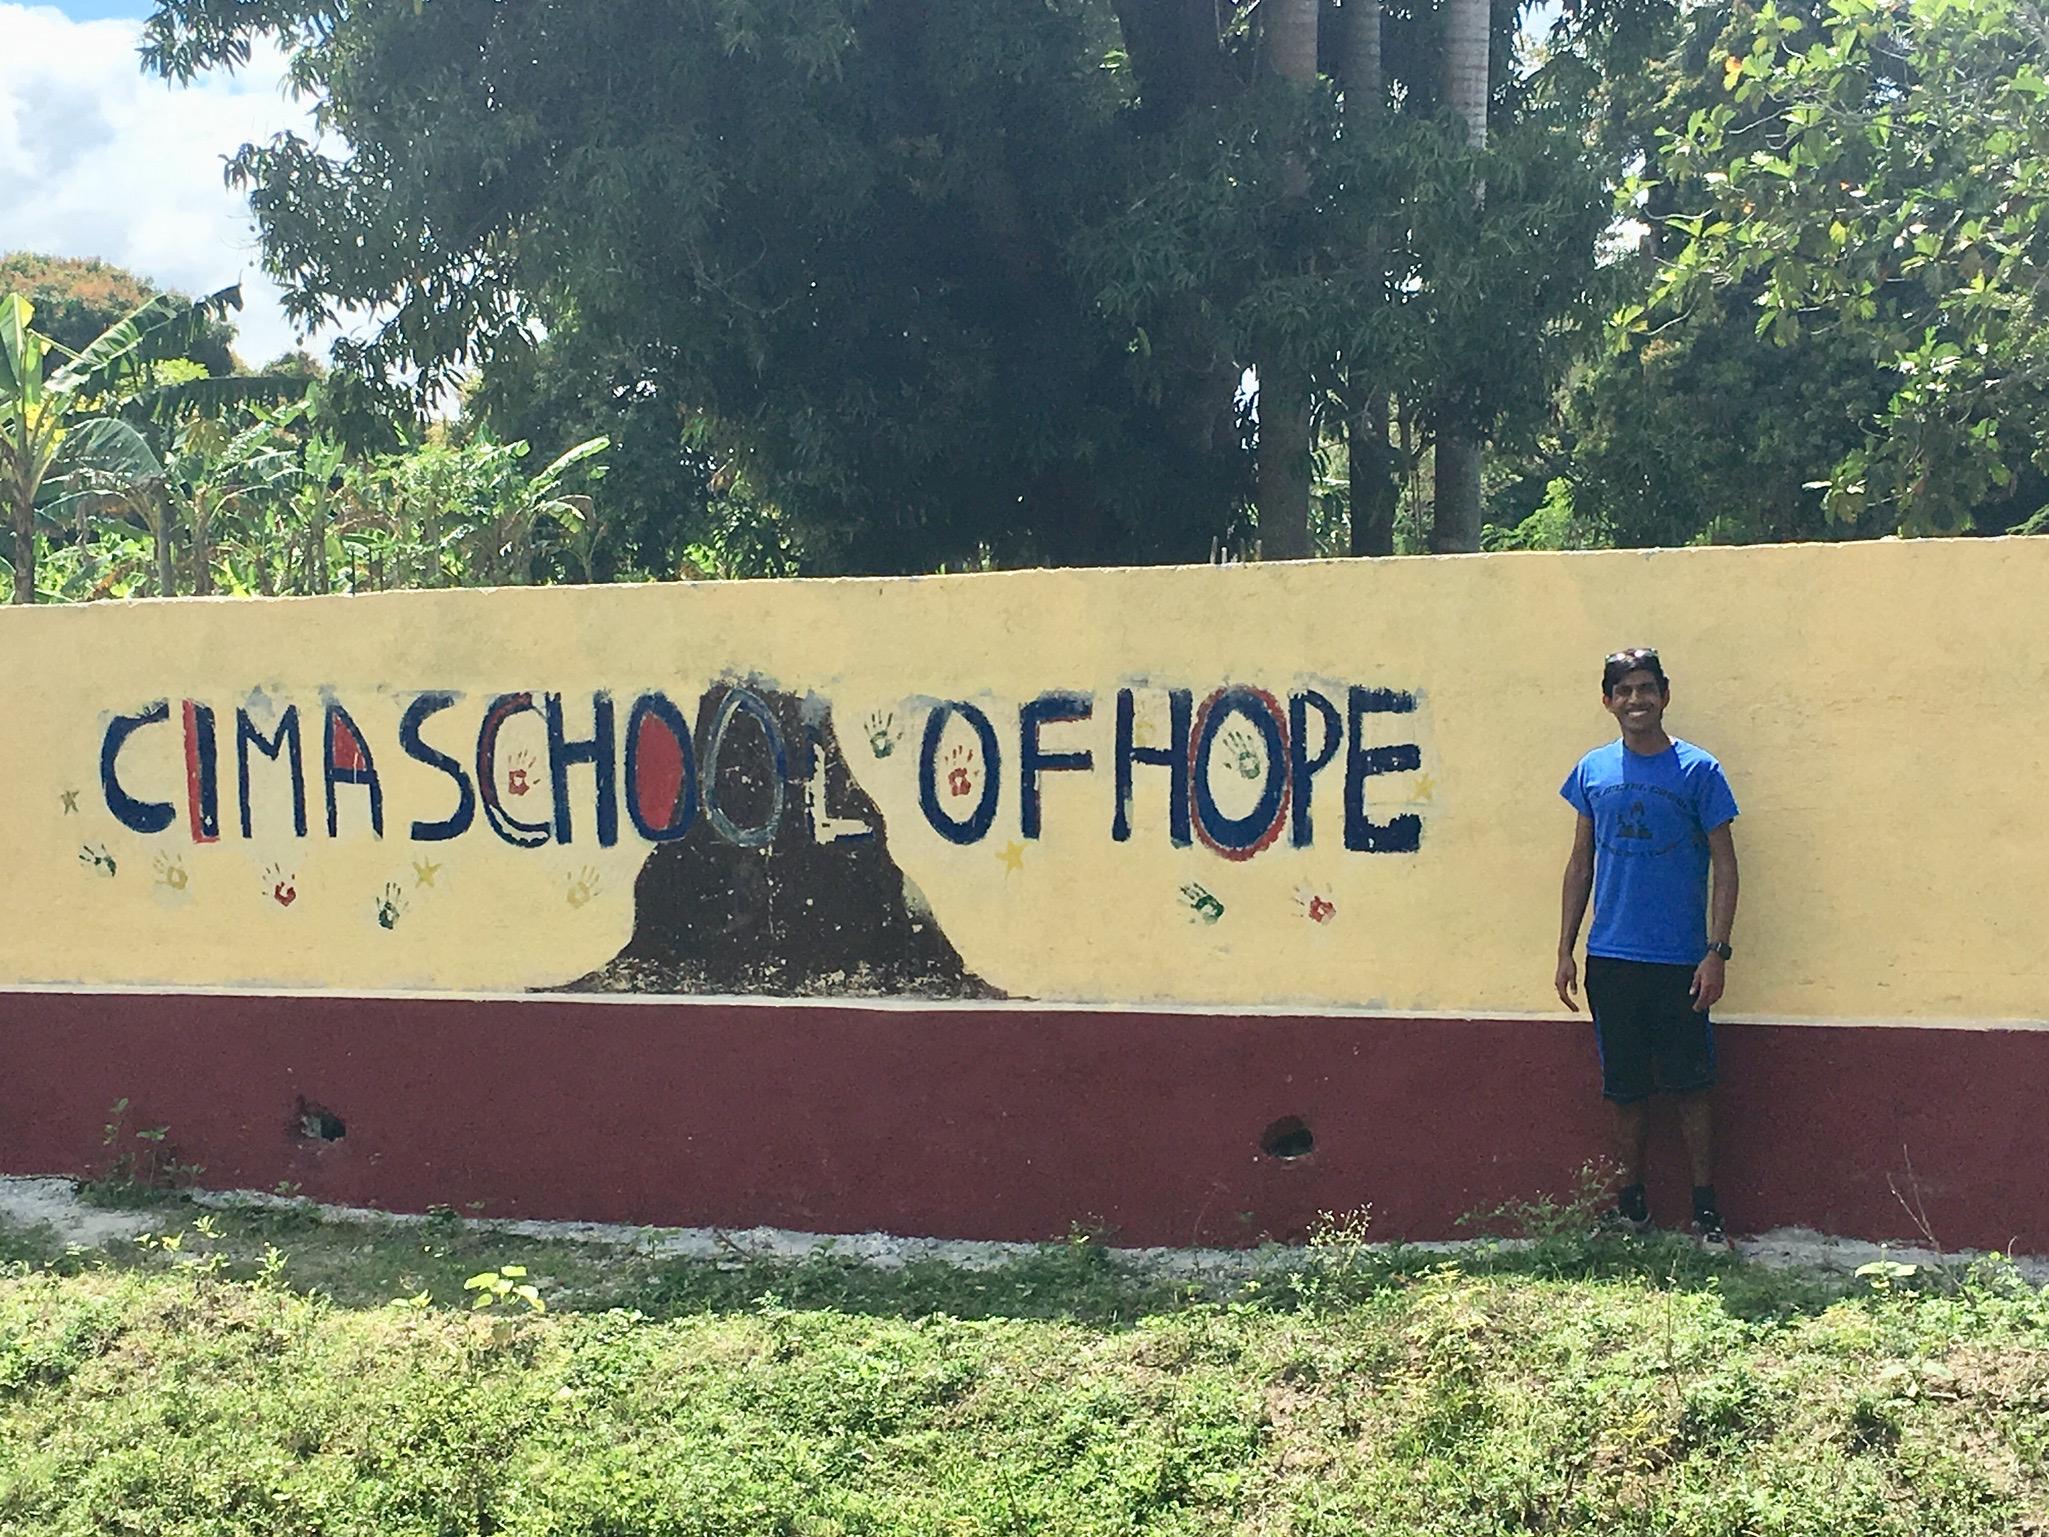 Entrance into Cima School of Hope